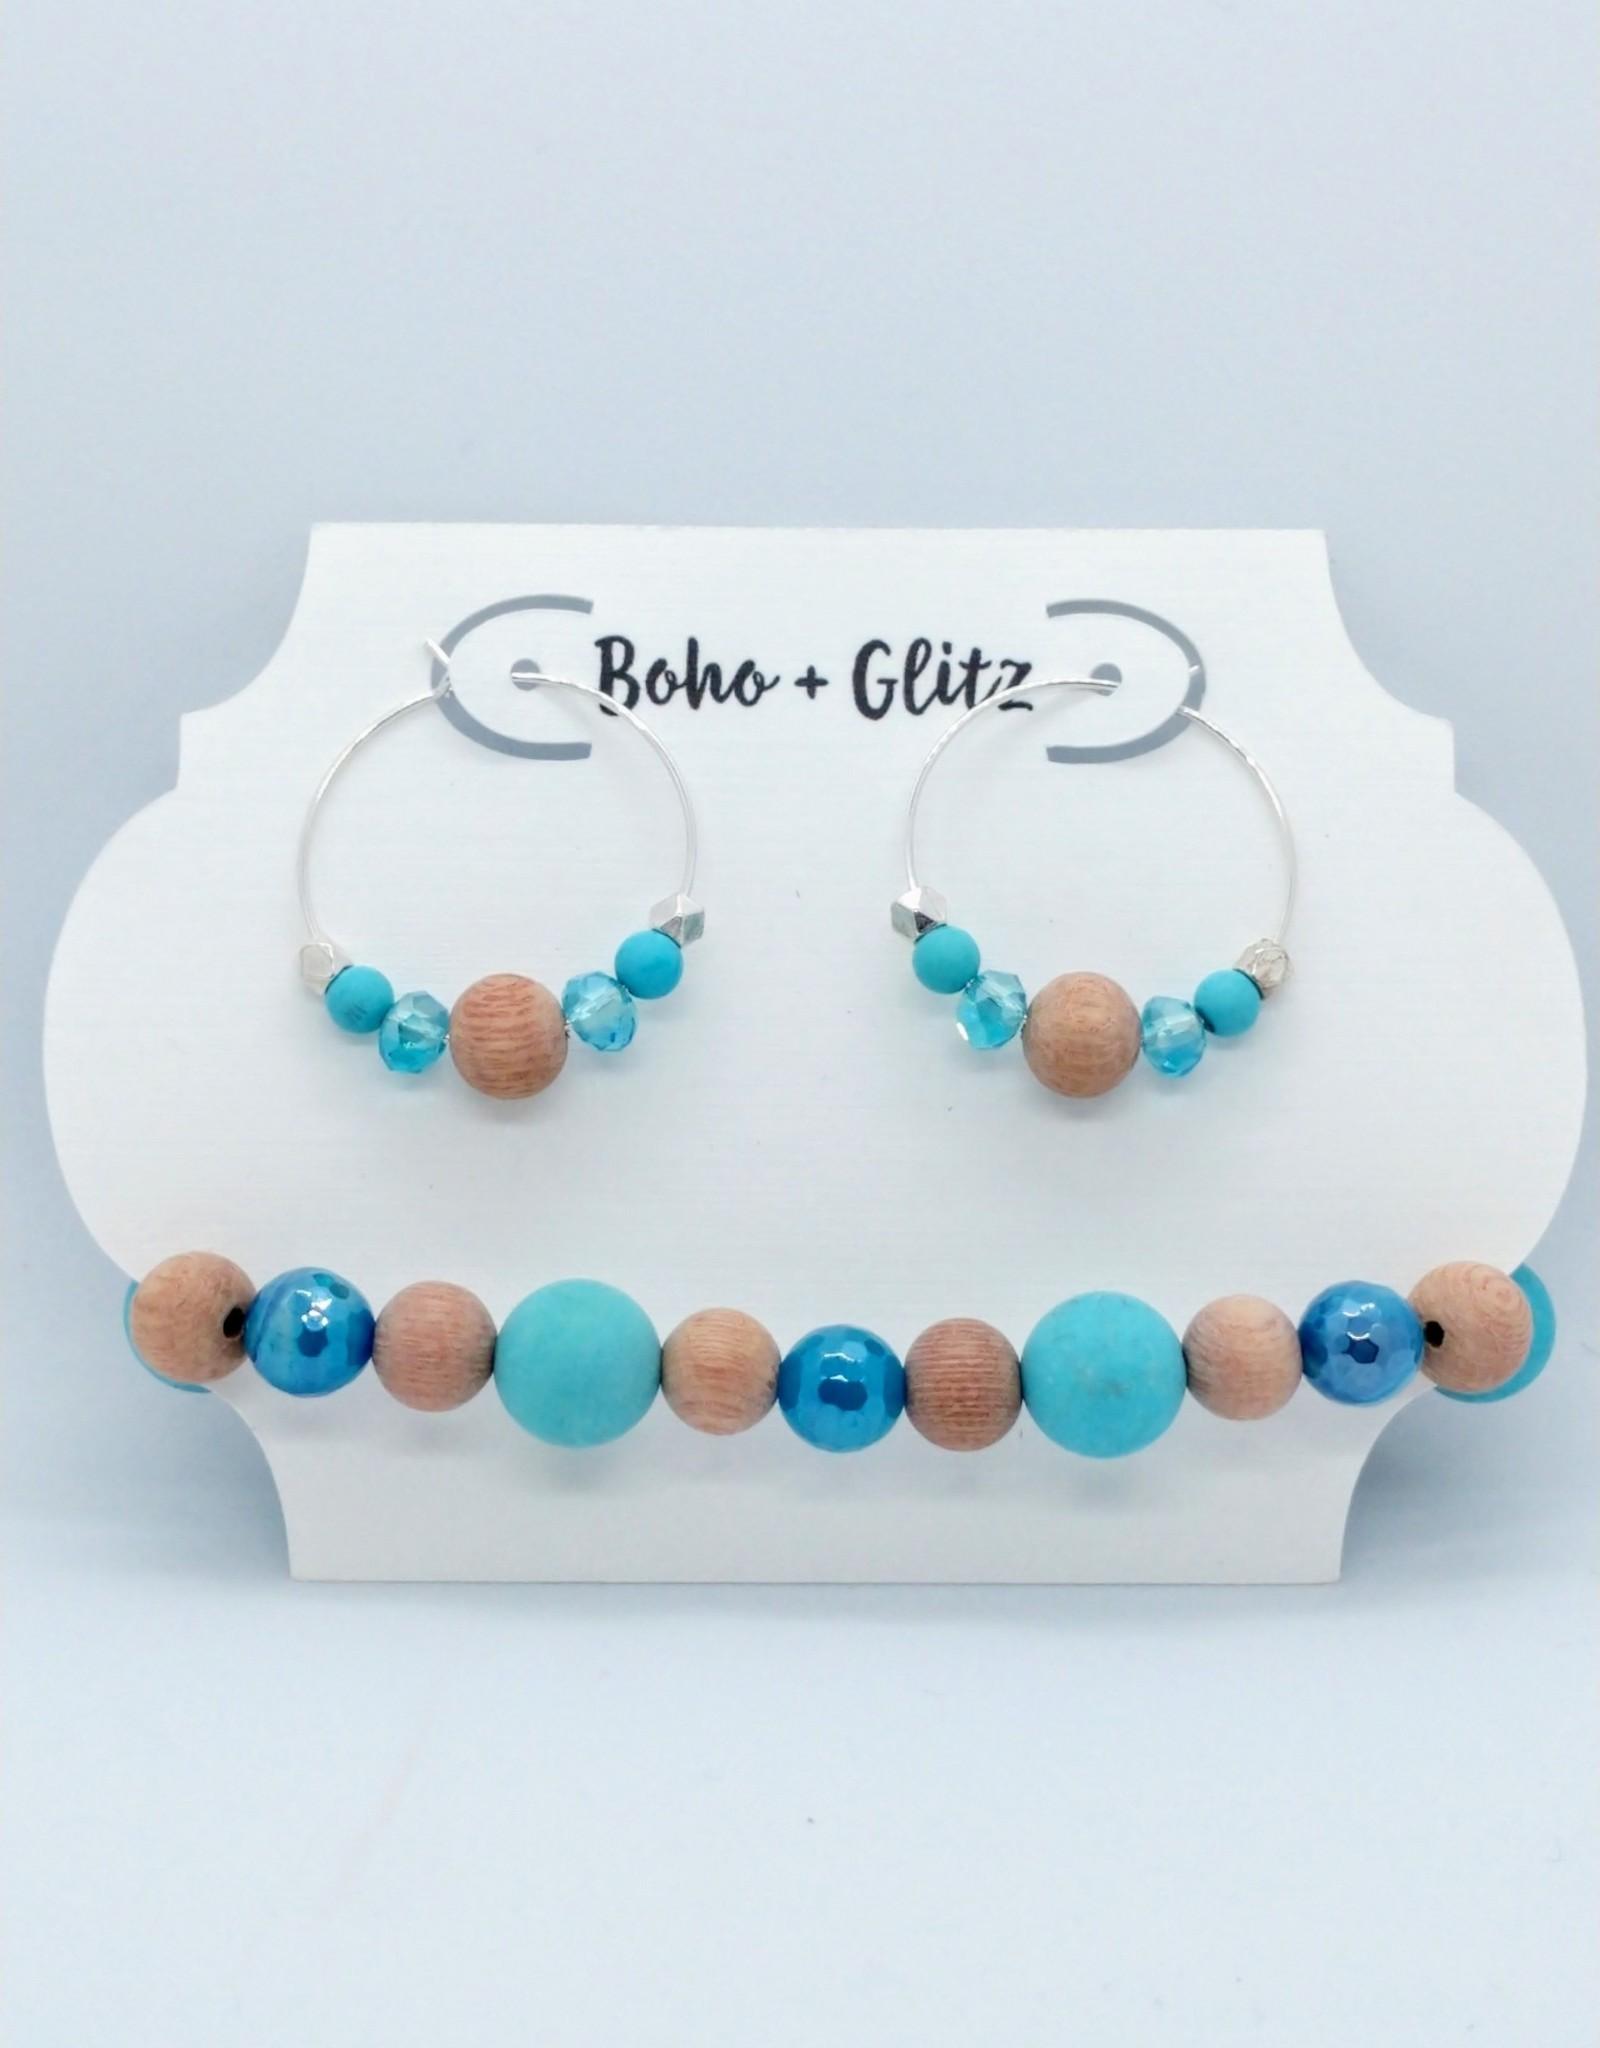 Boho & Glitz Boho & Glitz - Earring and Bracelet Combo ID4